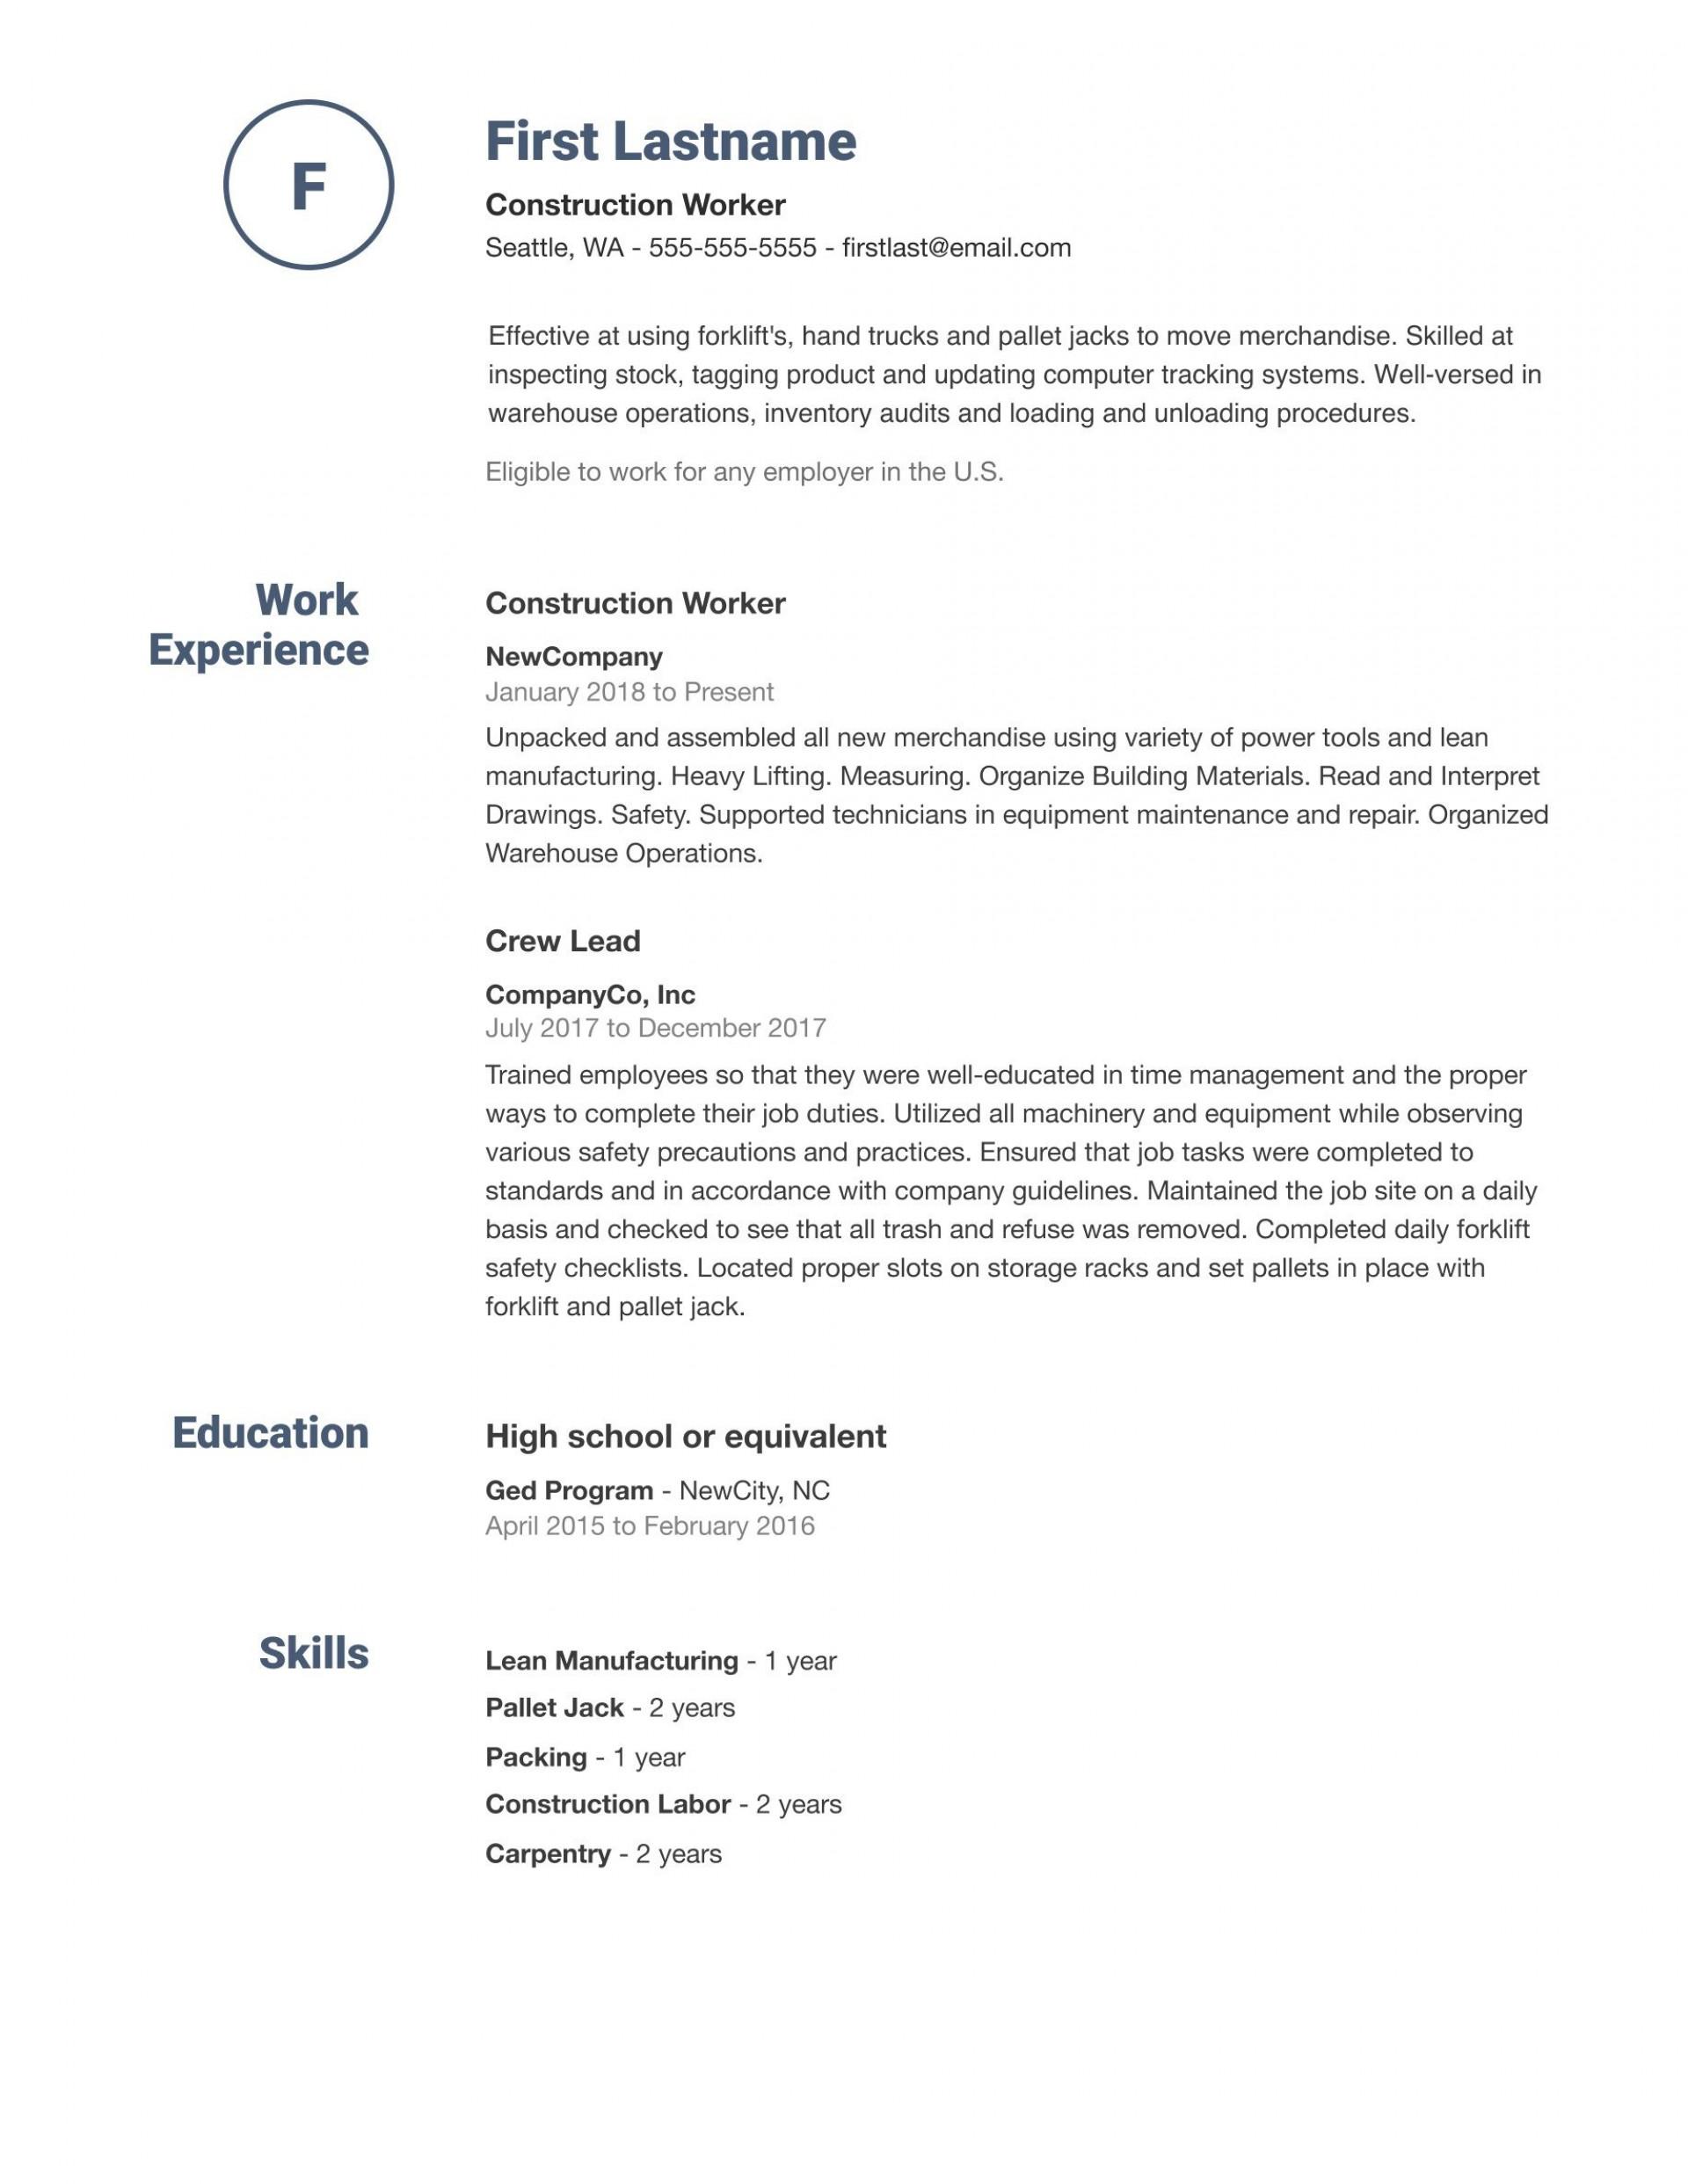 007 Frightening Basic Resume Template Free Design  Easy Download Word Australia Doc1920